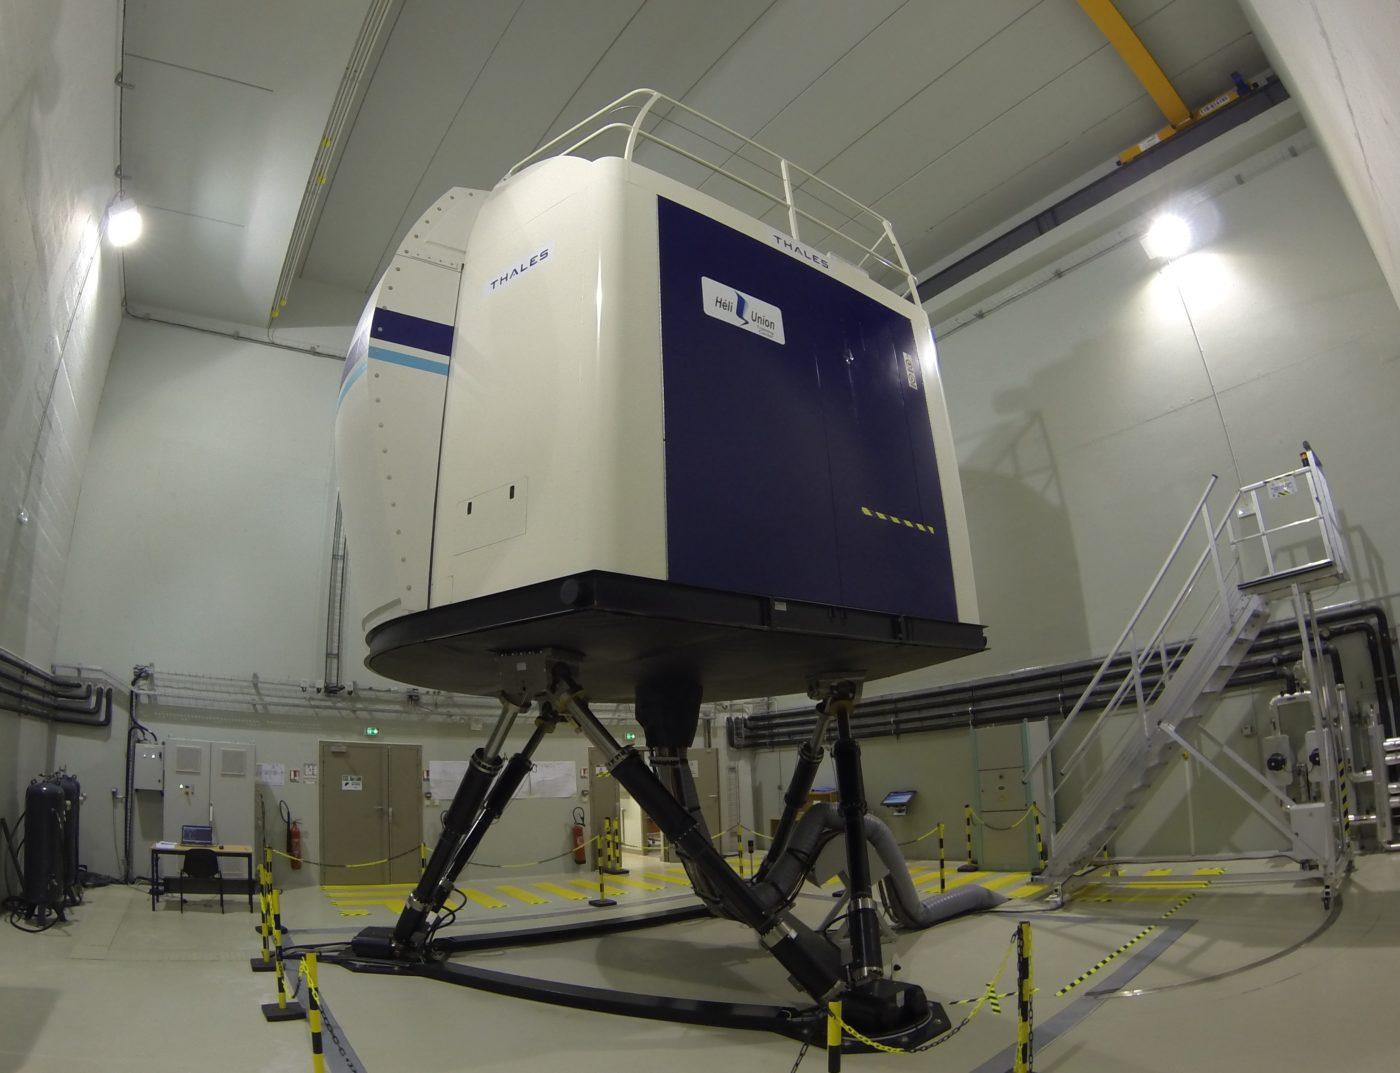 full-flight simulator AS365 - Vertical Magazine